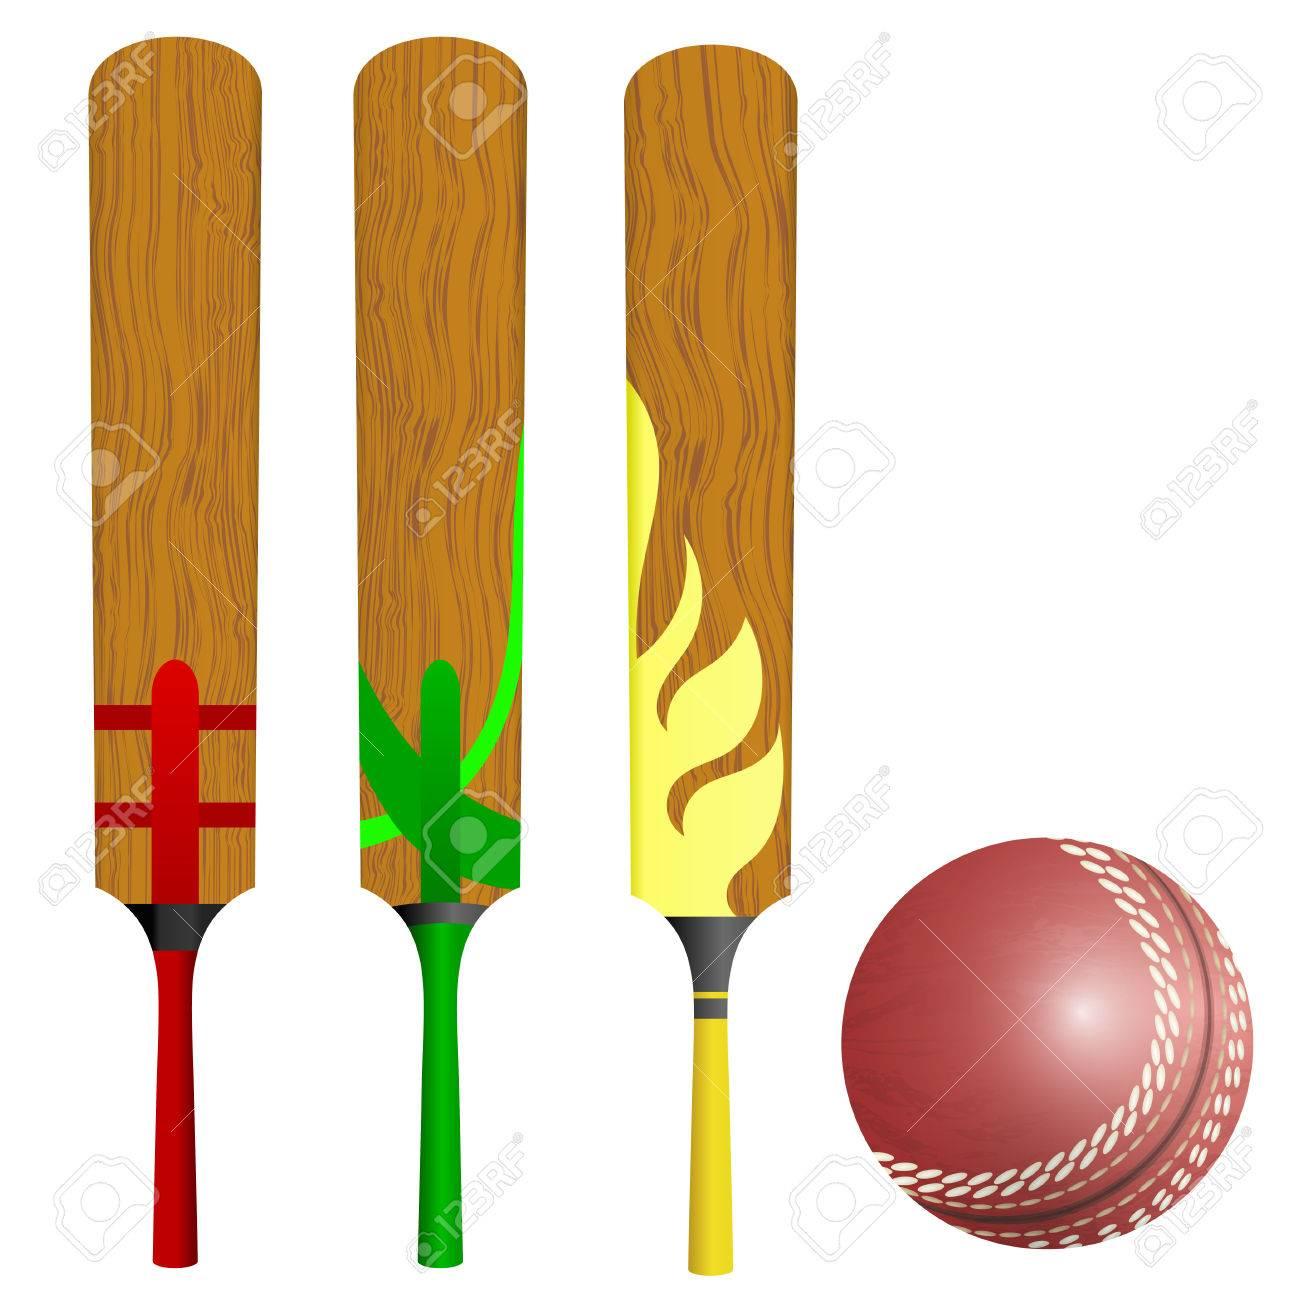 Cricket bats and ball Stock Vector - 22593335